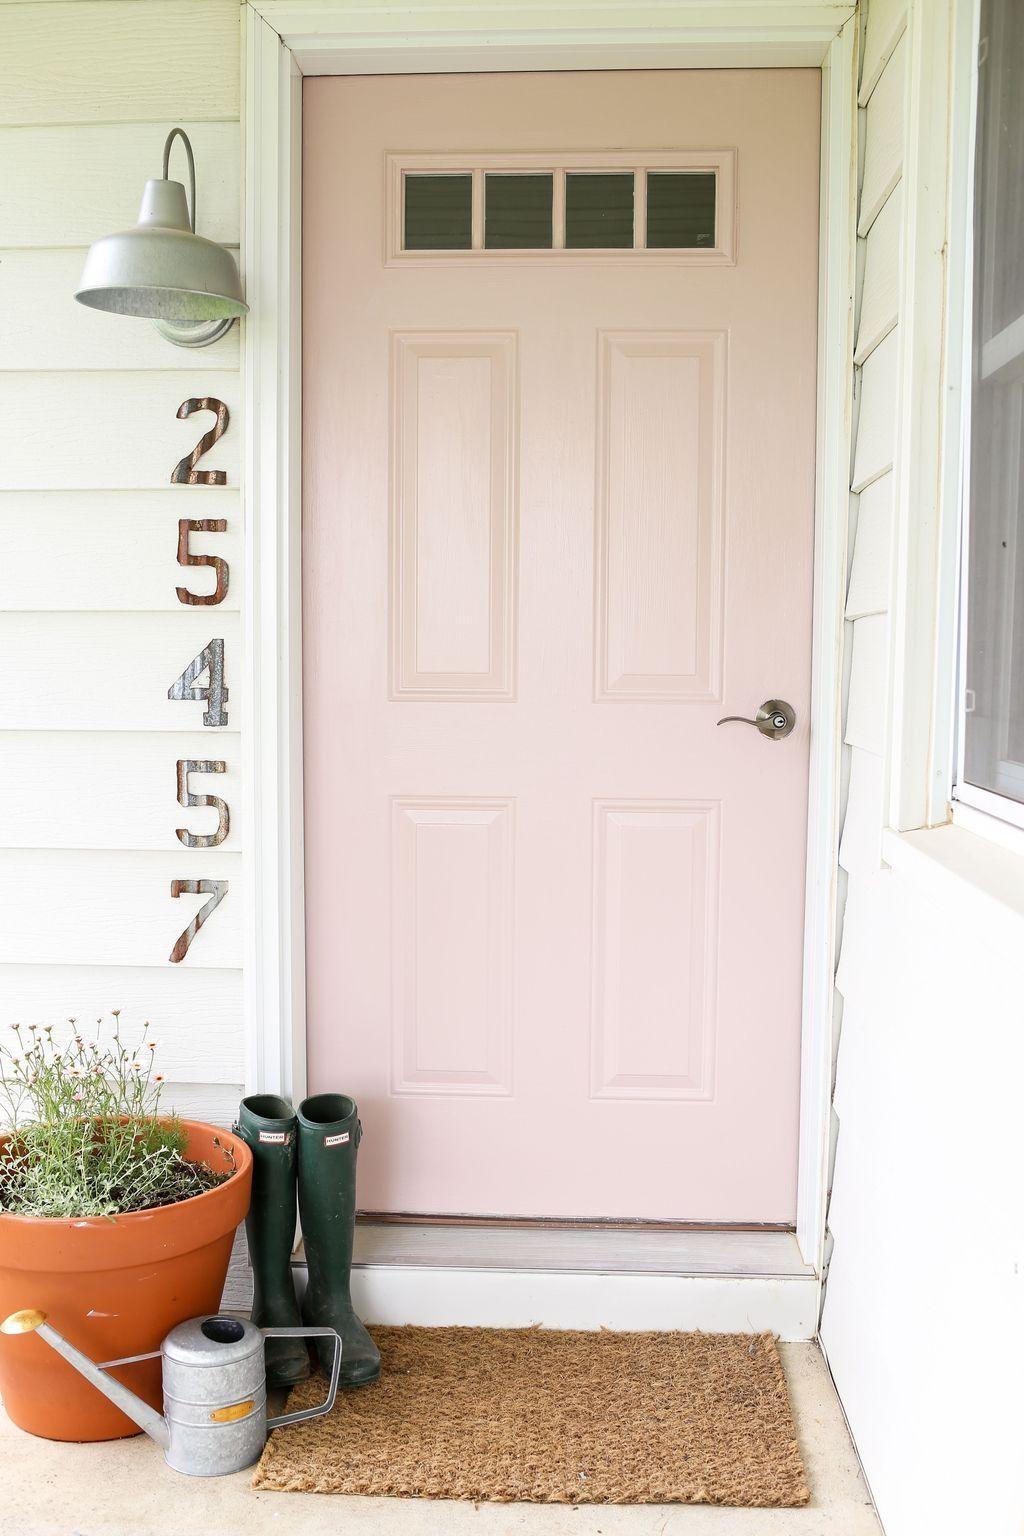 868 336 Exterior Home Design Ideas Remodel Pictures: 20 Unique Painted Exterior Door Ideas Exterior Design